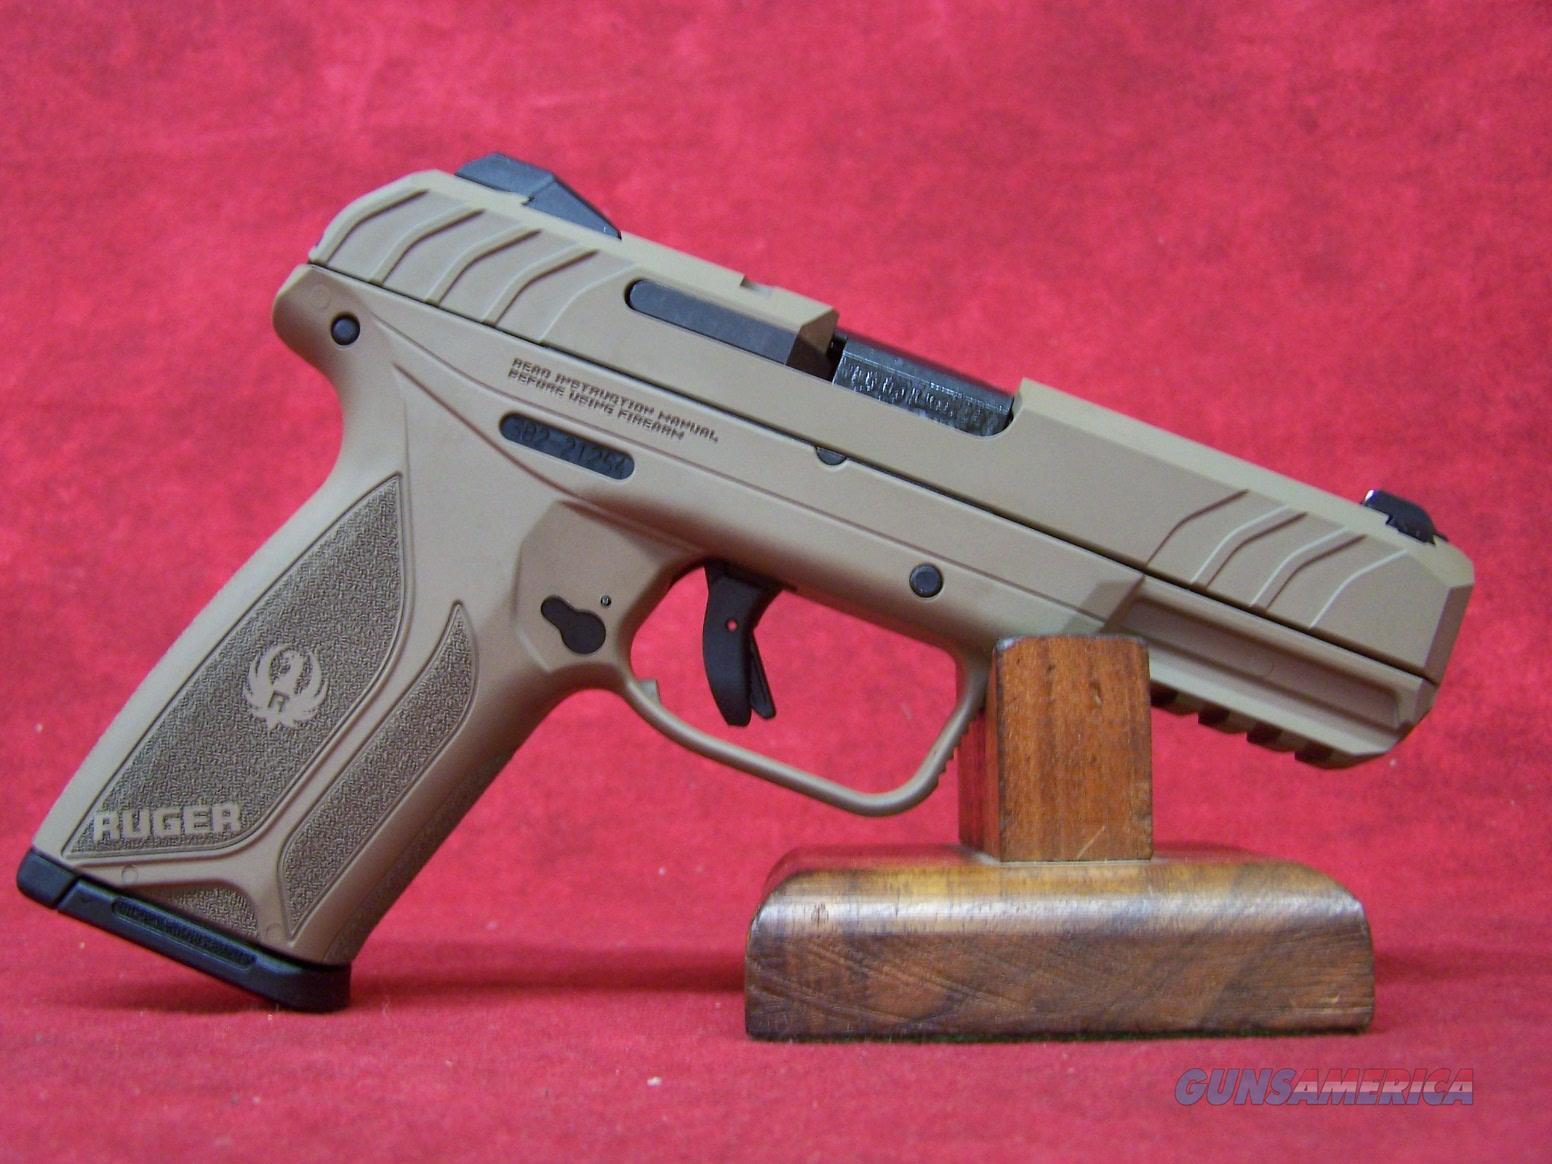 "Ruger Security 9 Brown Cerakote 9mm 4"" Barrel (03813)  Guns > Pistols > Ruger Semi-Auto Pistols > Security 9"